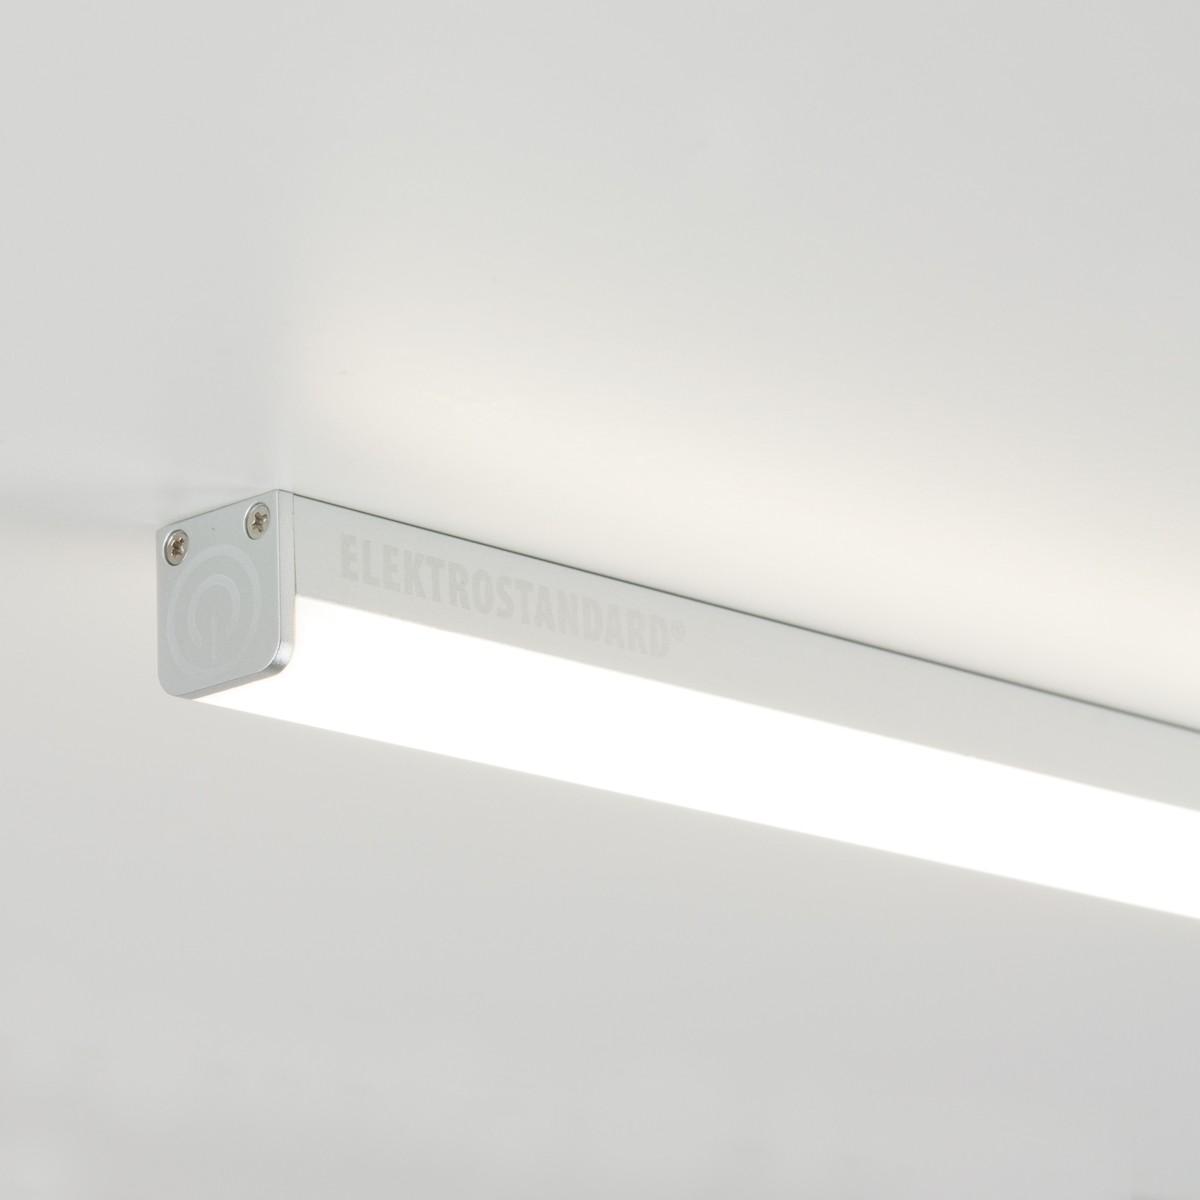 Фото Накладной светильник Elektrostandard Led Stick a035184